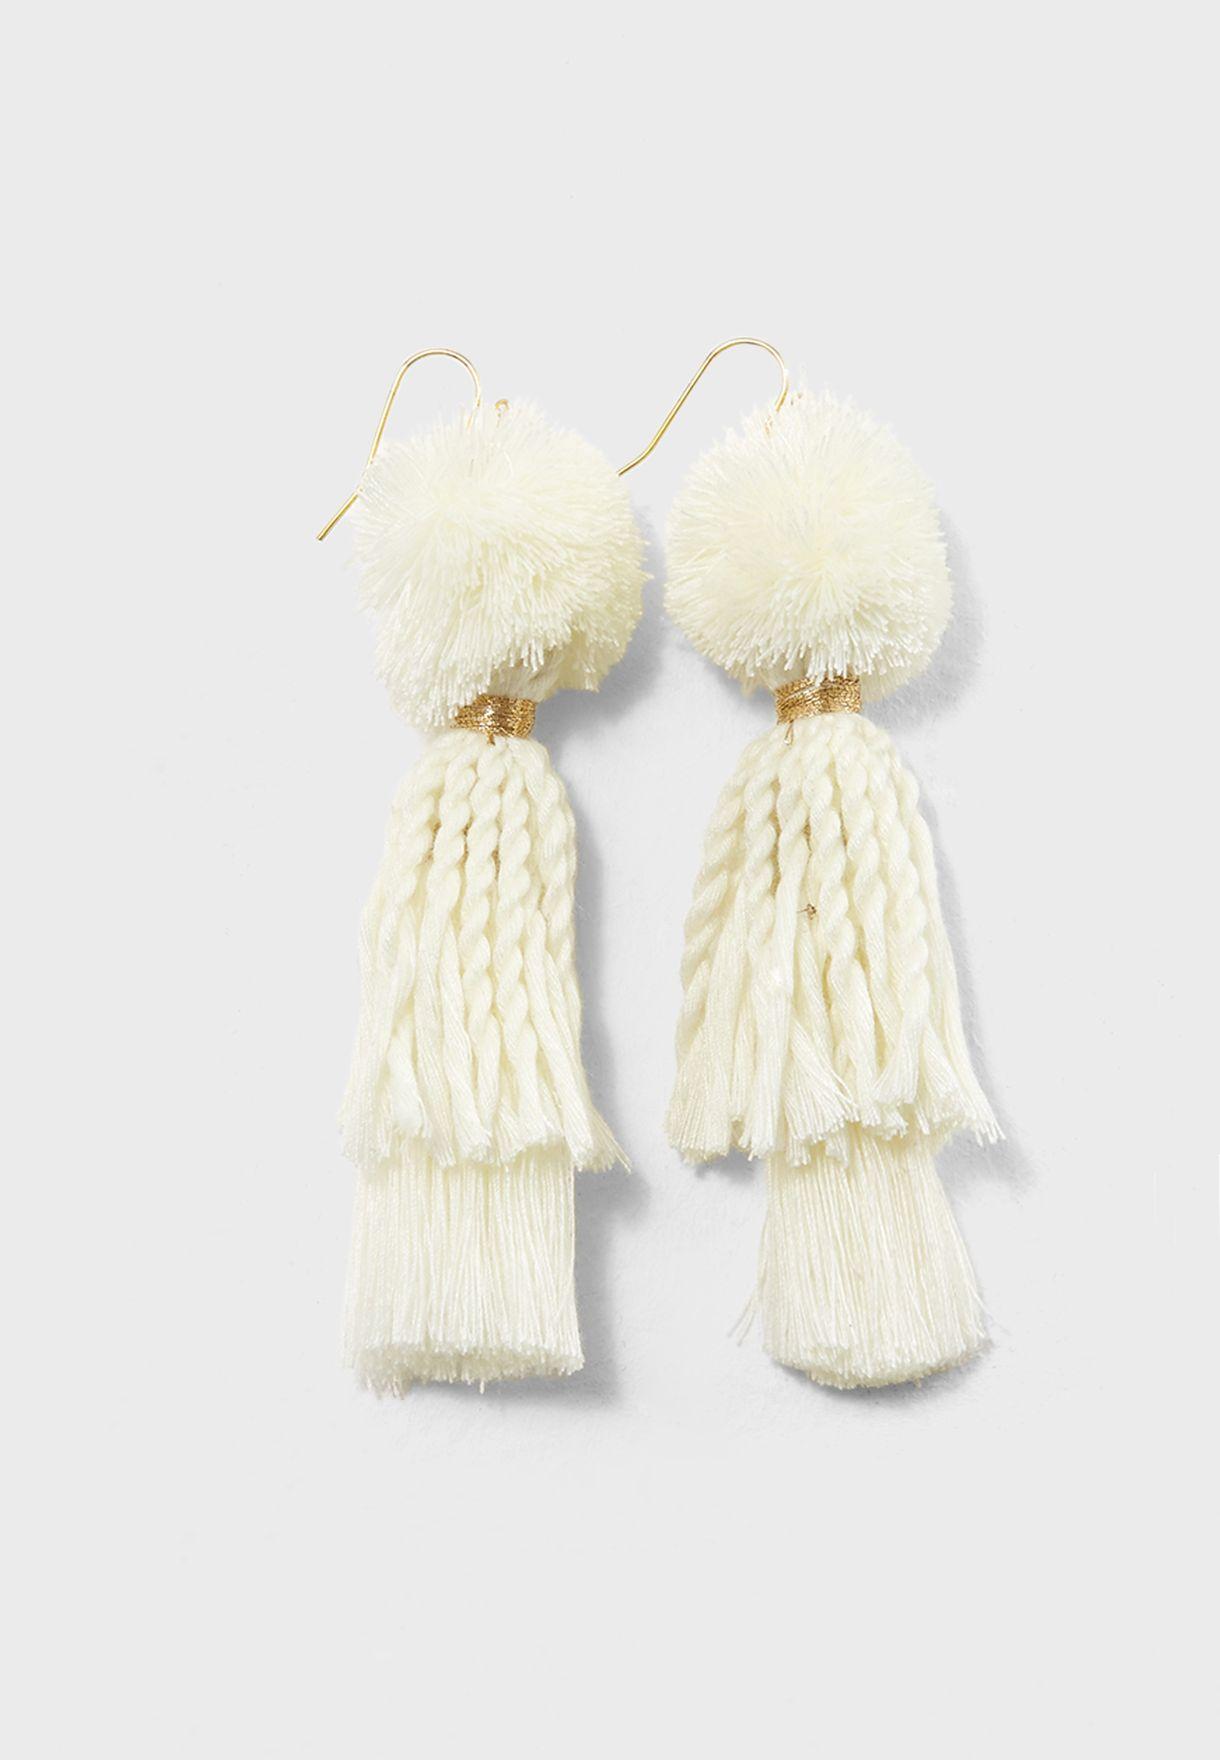 Poolside Earrings